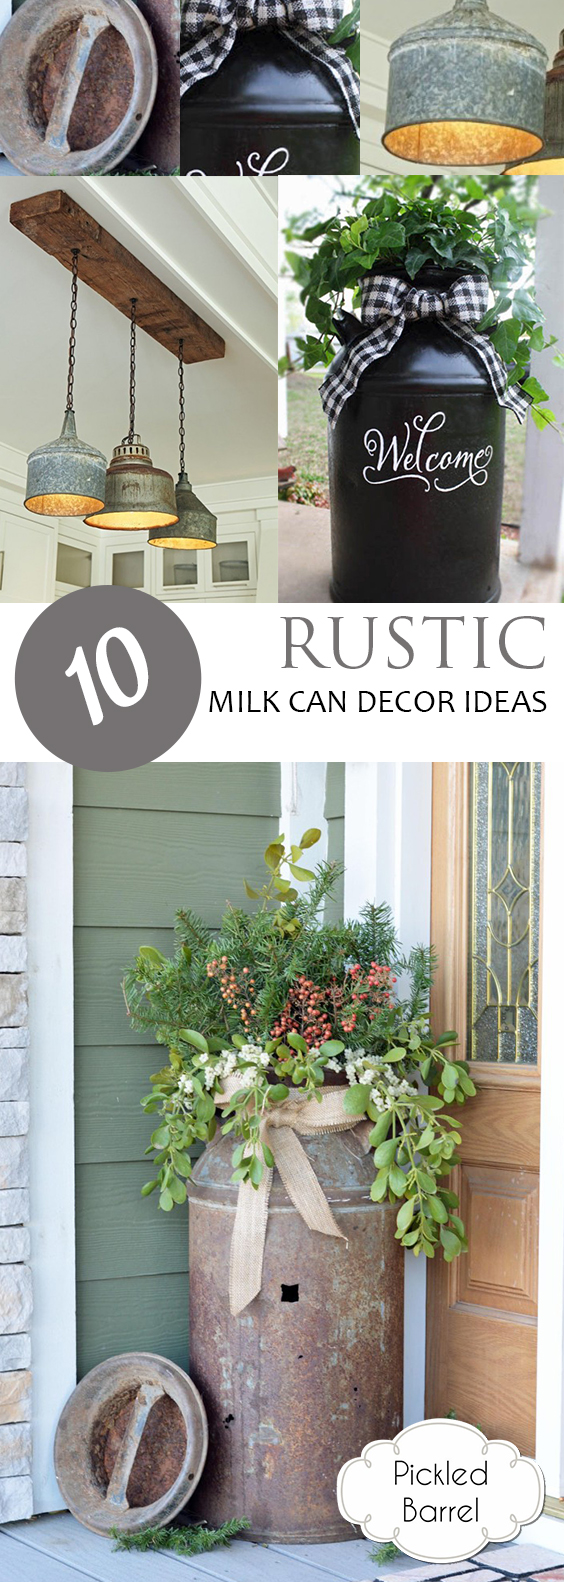 10 Rustic Milk Can Decor Ideas| Rustic Milk Can Decor, Rustic Home Decor, DIY Rustic Home Decor, Home Decor Hacks, DIY Home Decor, Simple Rustic Decor, Farmhouse Decor, Farmhouse Decor Hacks, DIY Home #RusticHome #FarmhouseHomeDecor